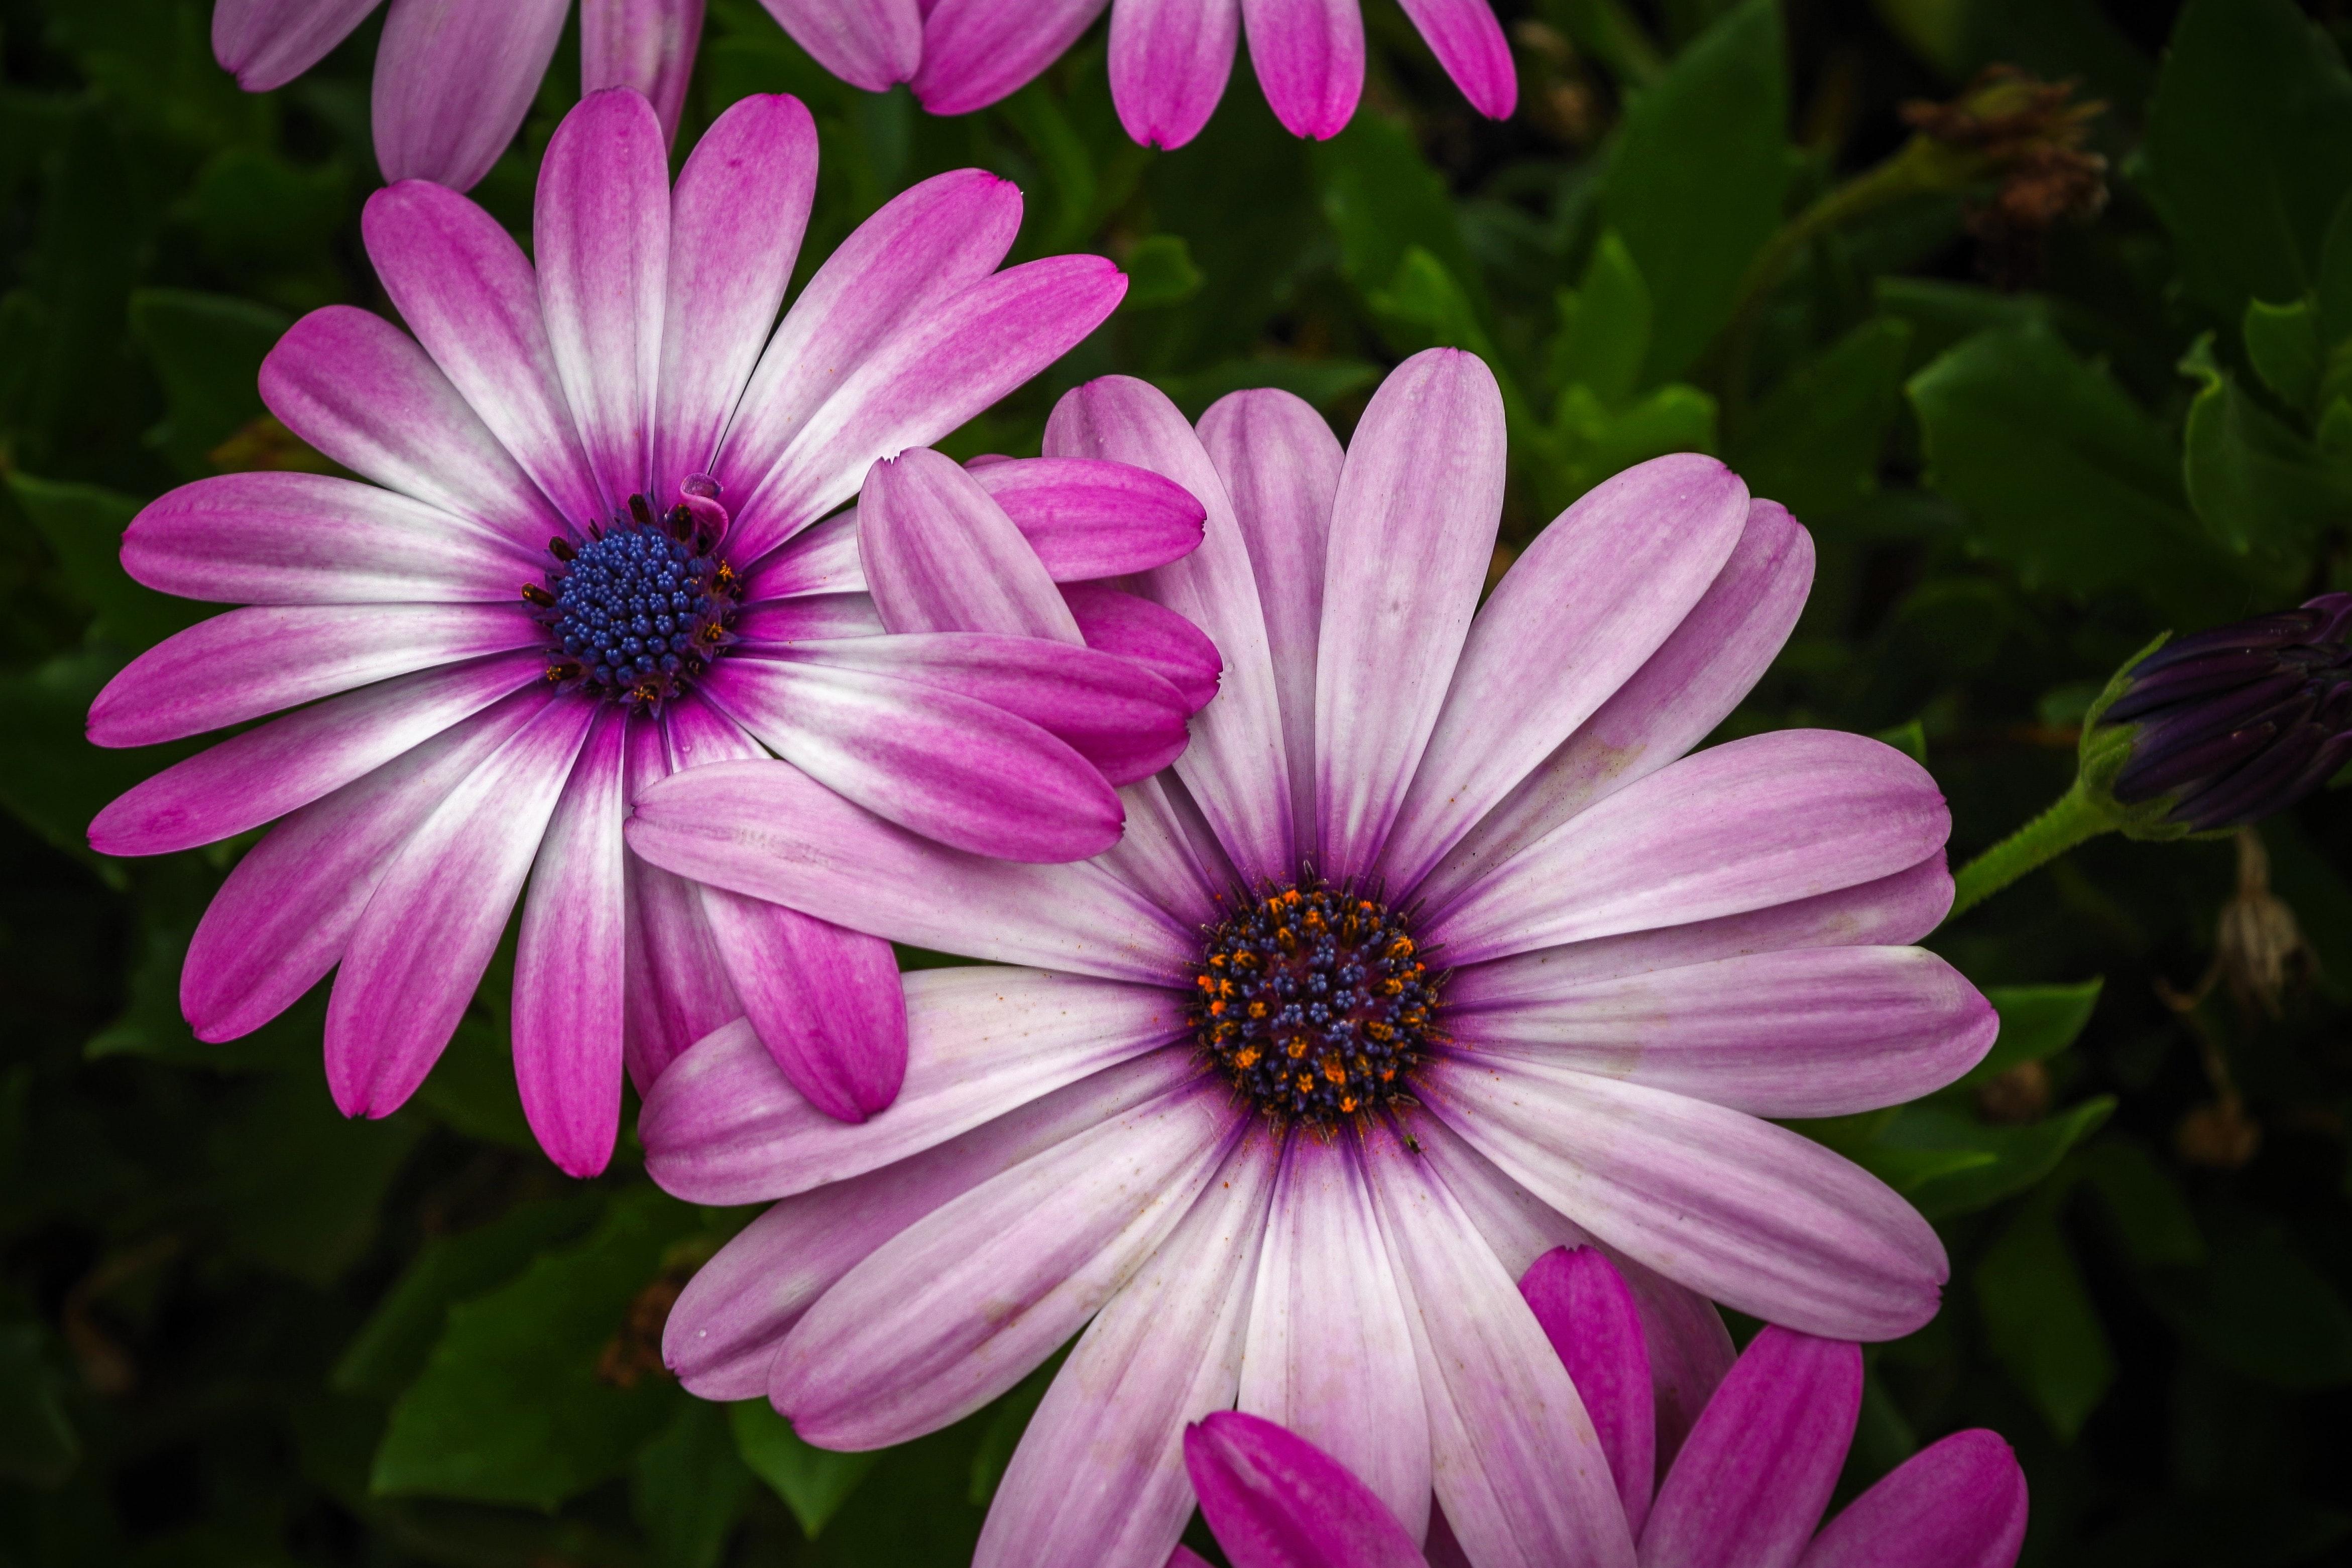 Pink petal flower photo